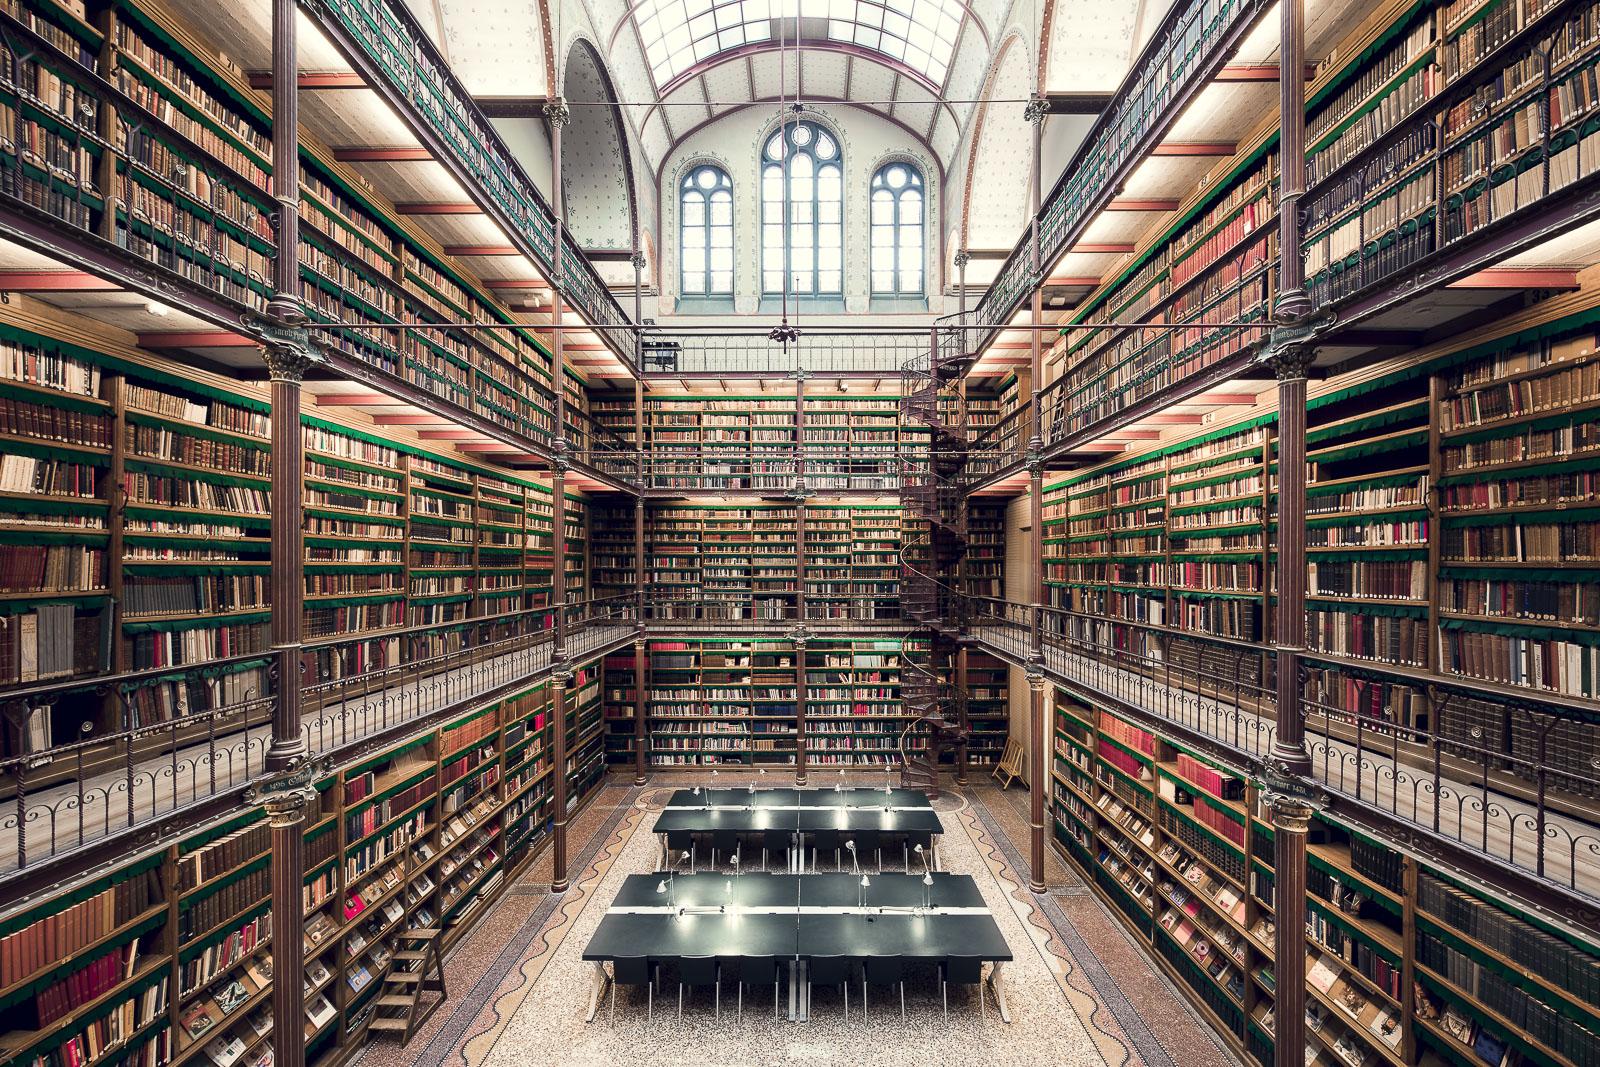 The Rijksmuseum Library, Amsterdam, 1885